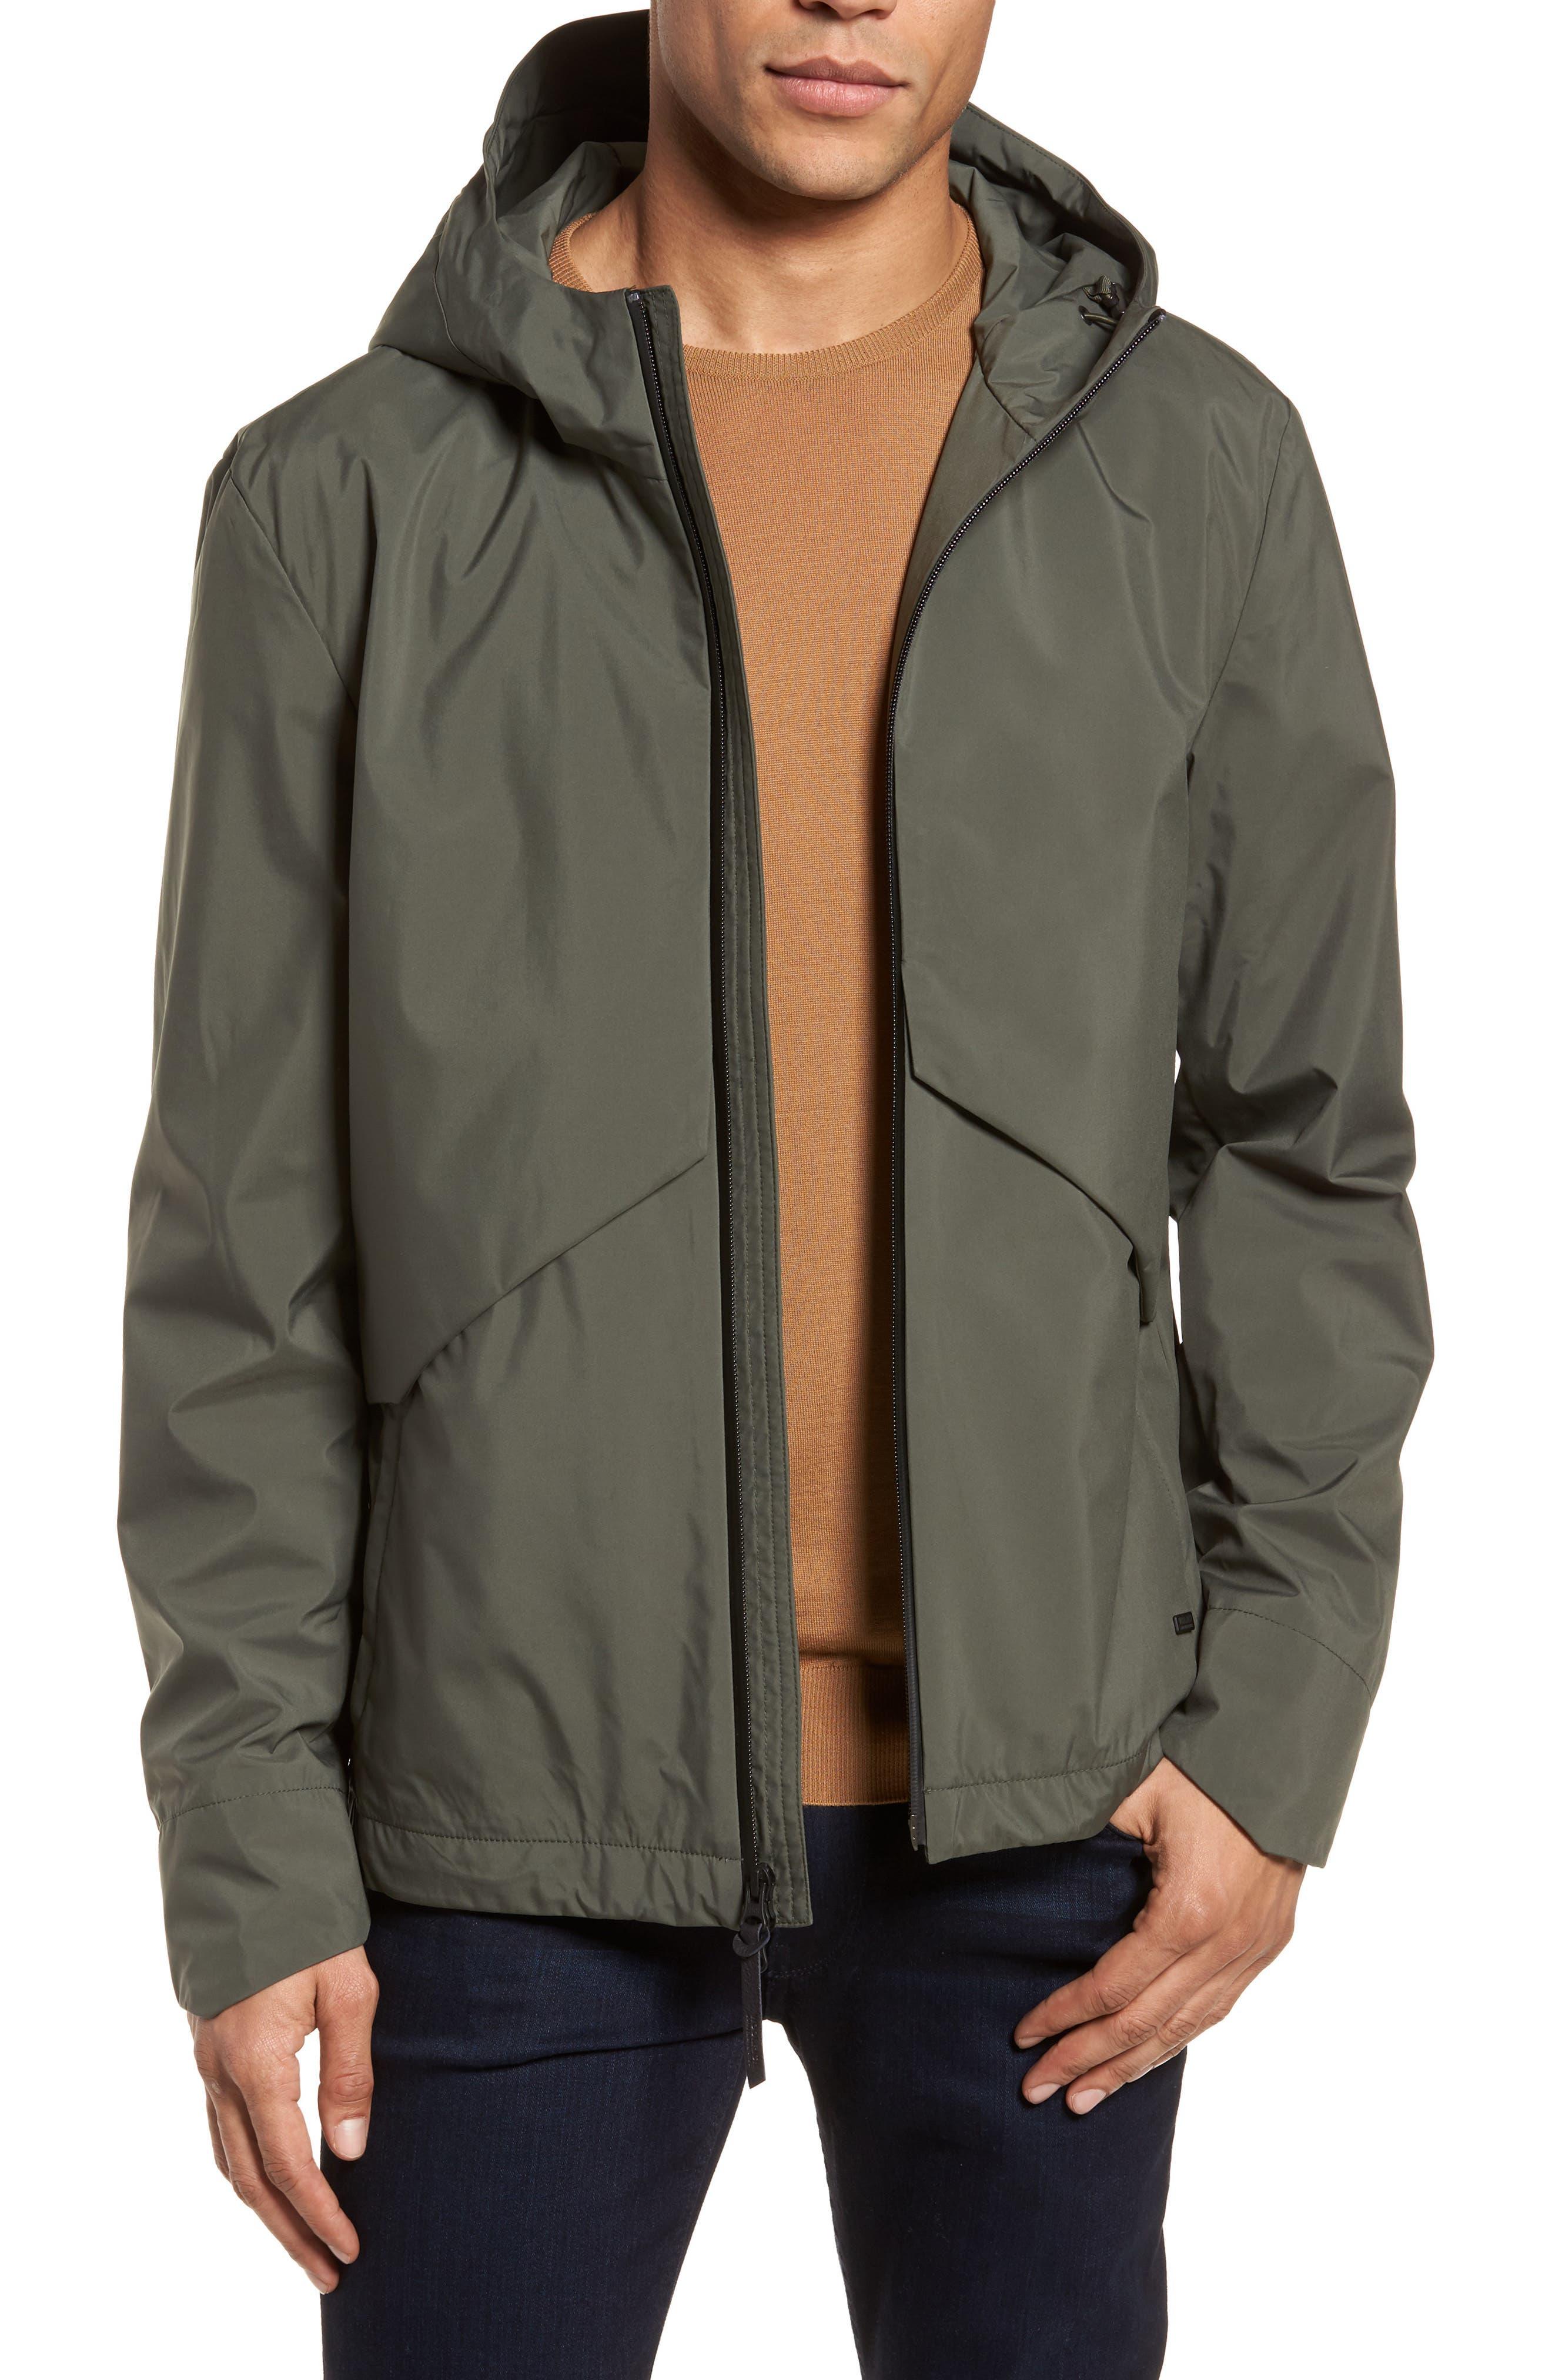 & Bros. Navigator Field Jacket,                             Main thumbnail 1, color,                             Grape Leaf